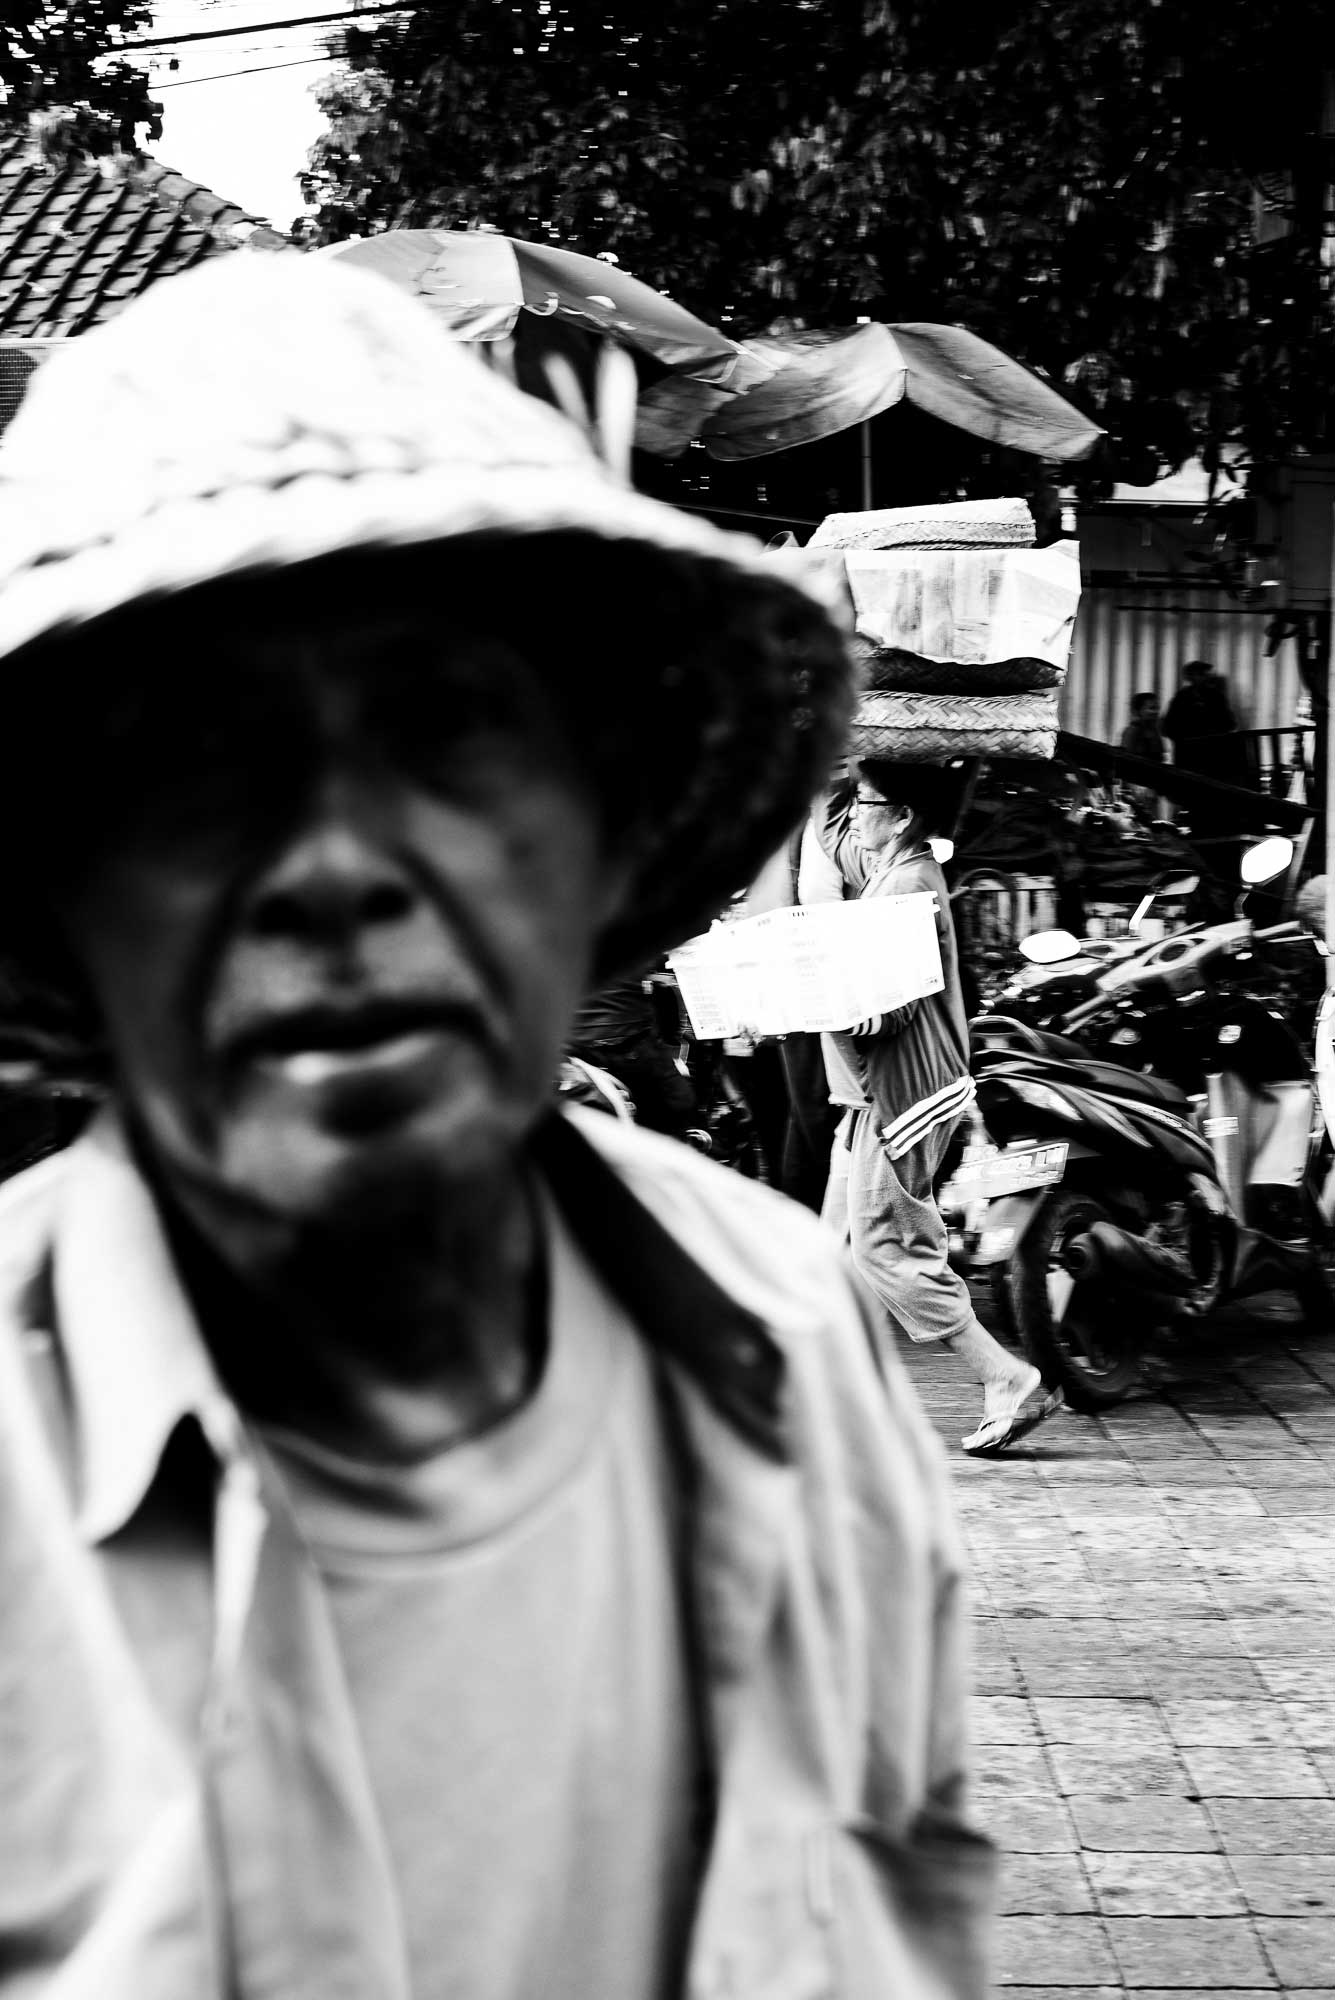 Street Portrait of a Hat Vendor - Bali Street Photographer